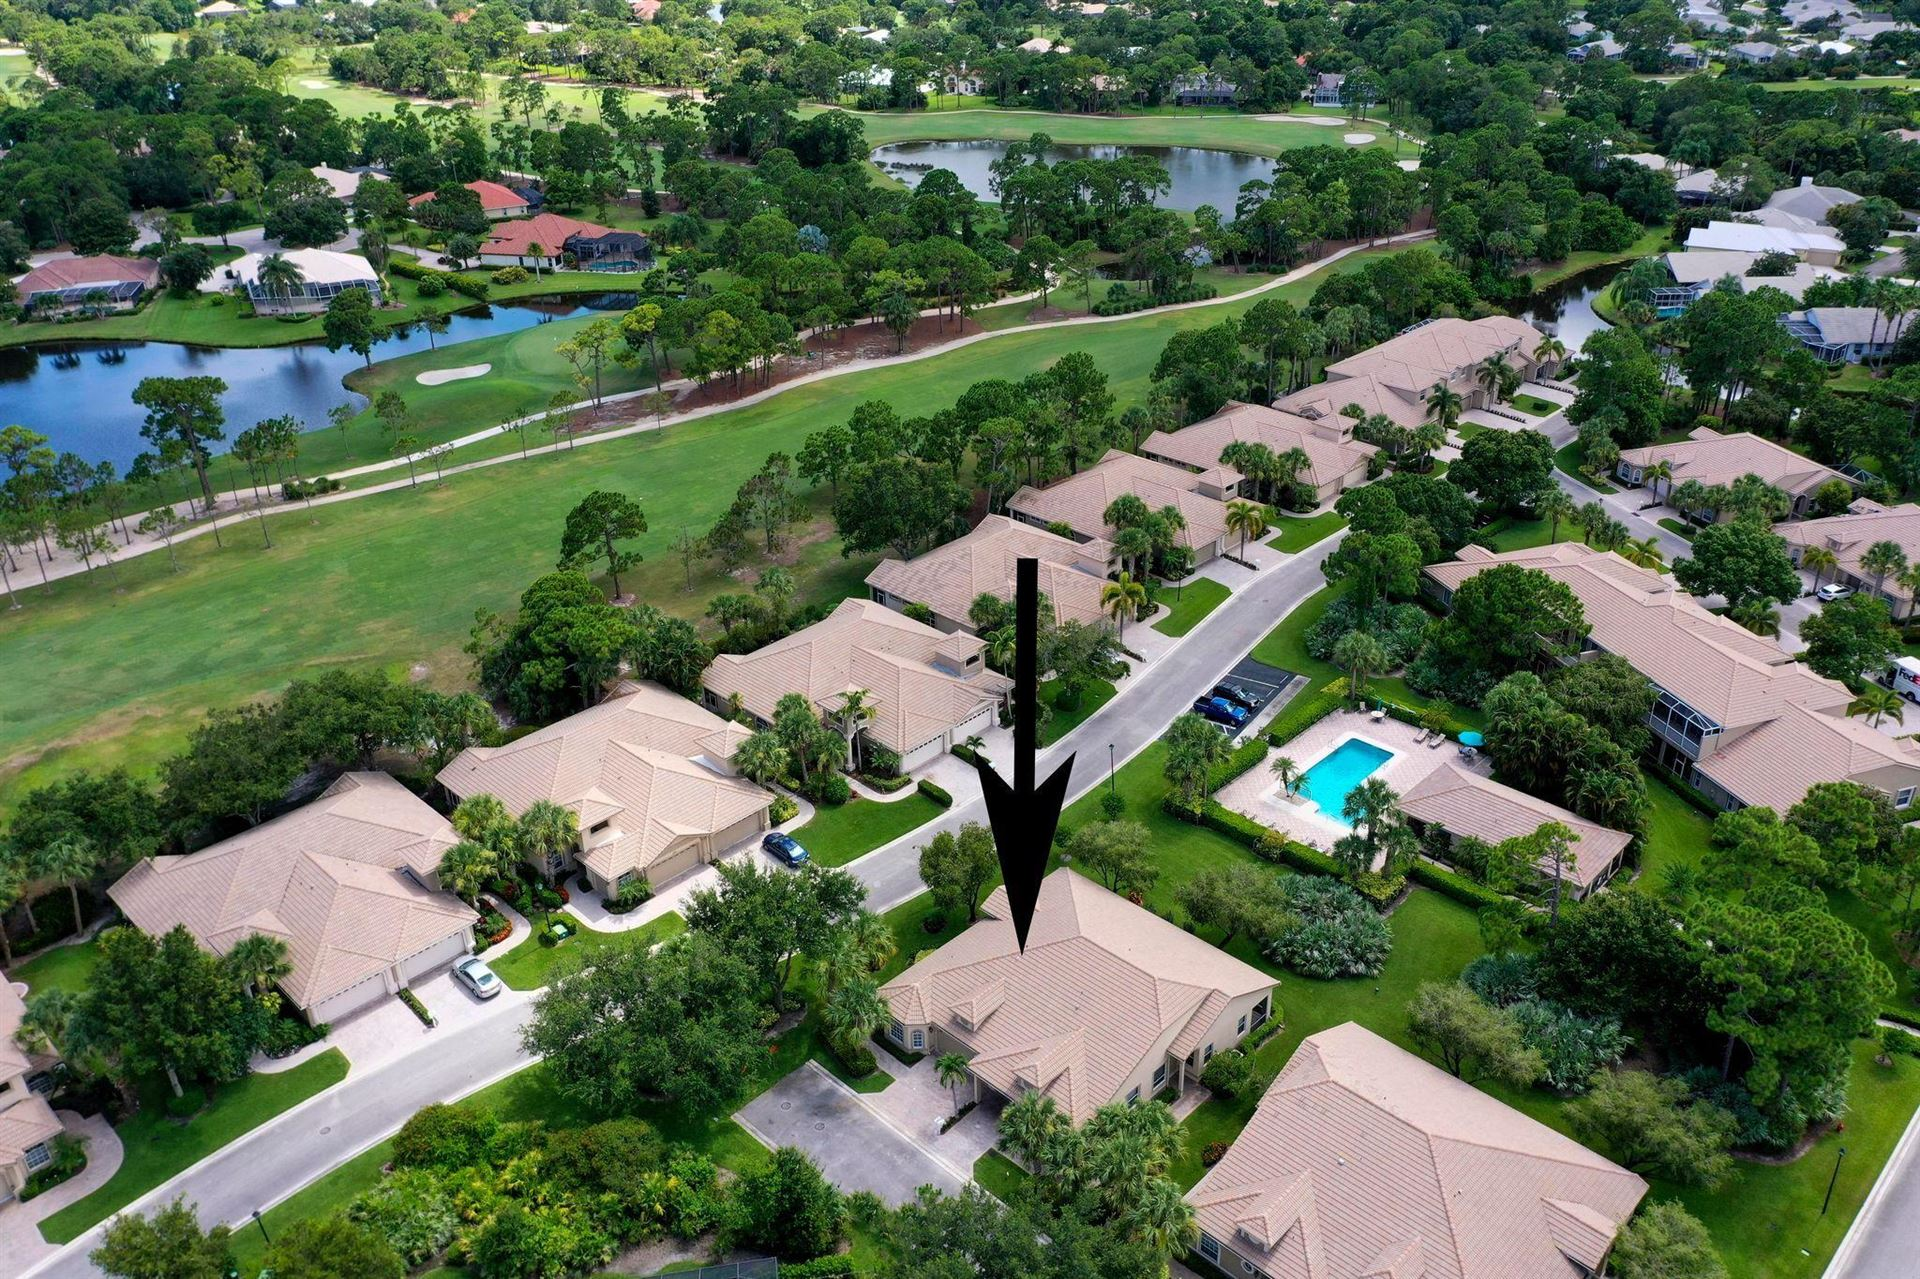 Photo of 7087 Torrey Pines Circle, Port Saint Lucie, FL 34986 (MLS # RX-10635527)